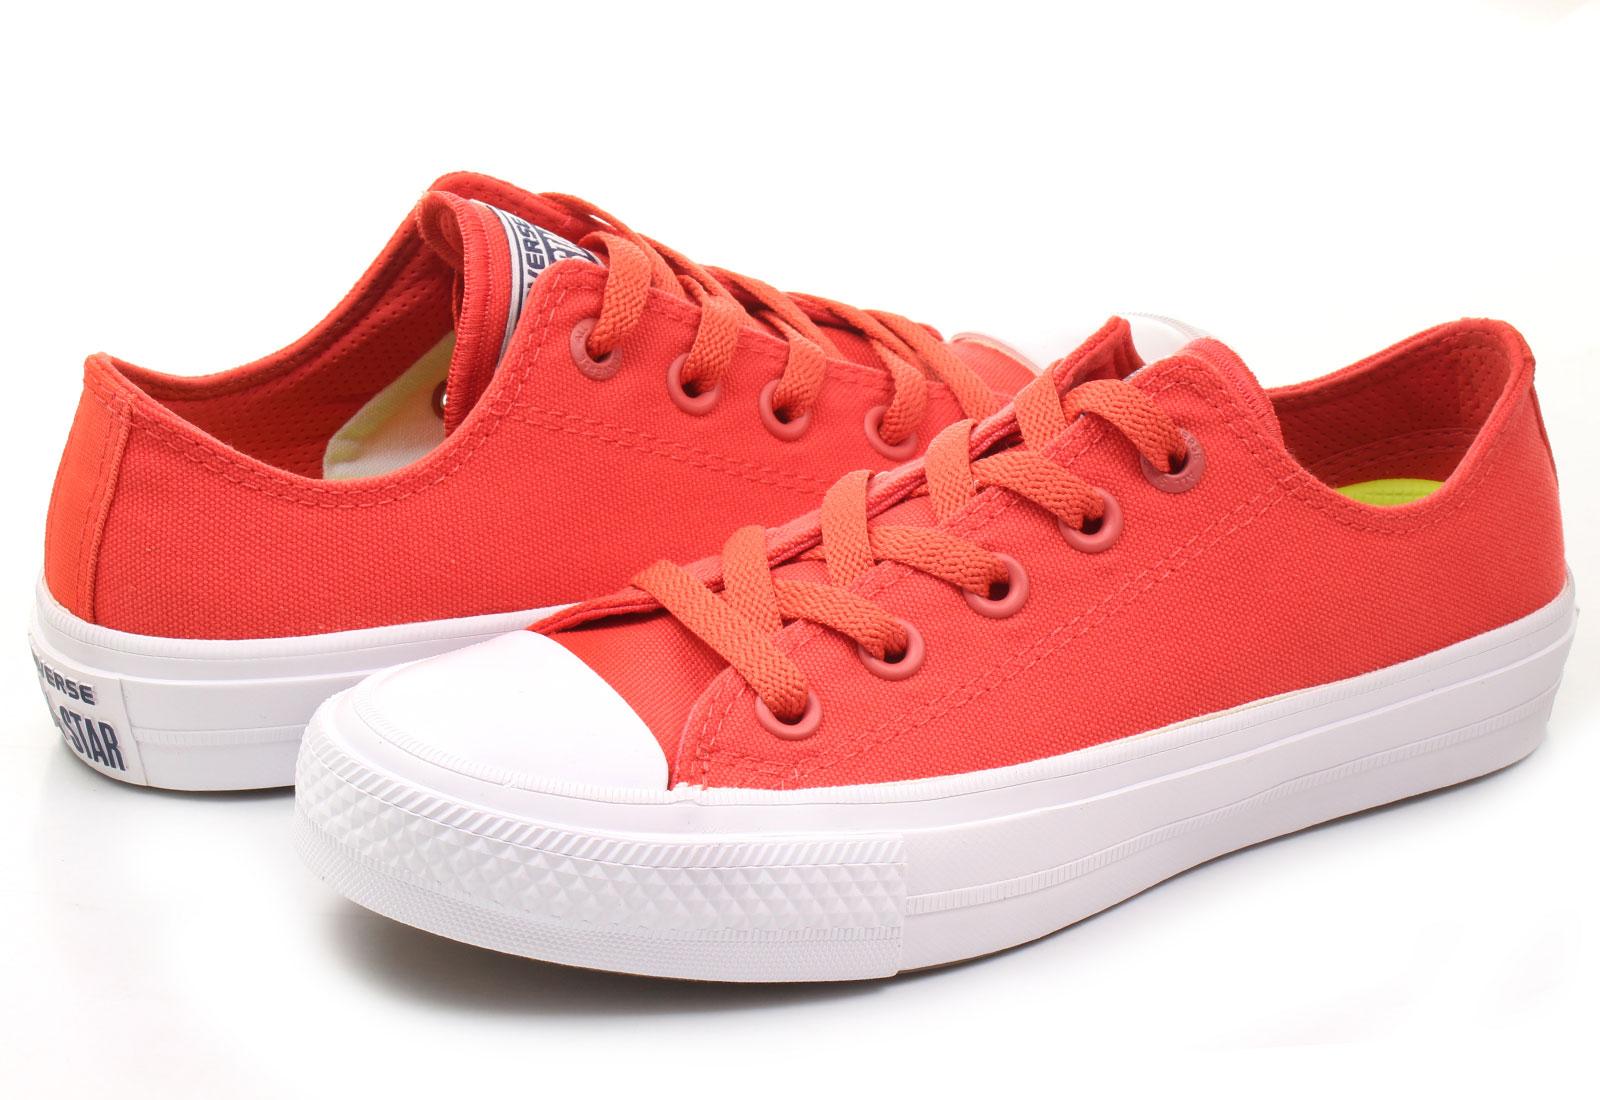 Converse Sneakers - Chuck Taylor All Star II Ox - 151123C - Online ... e1e08a10f